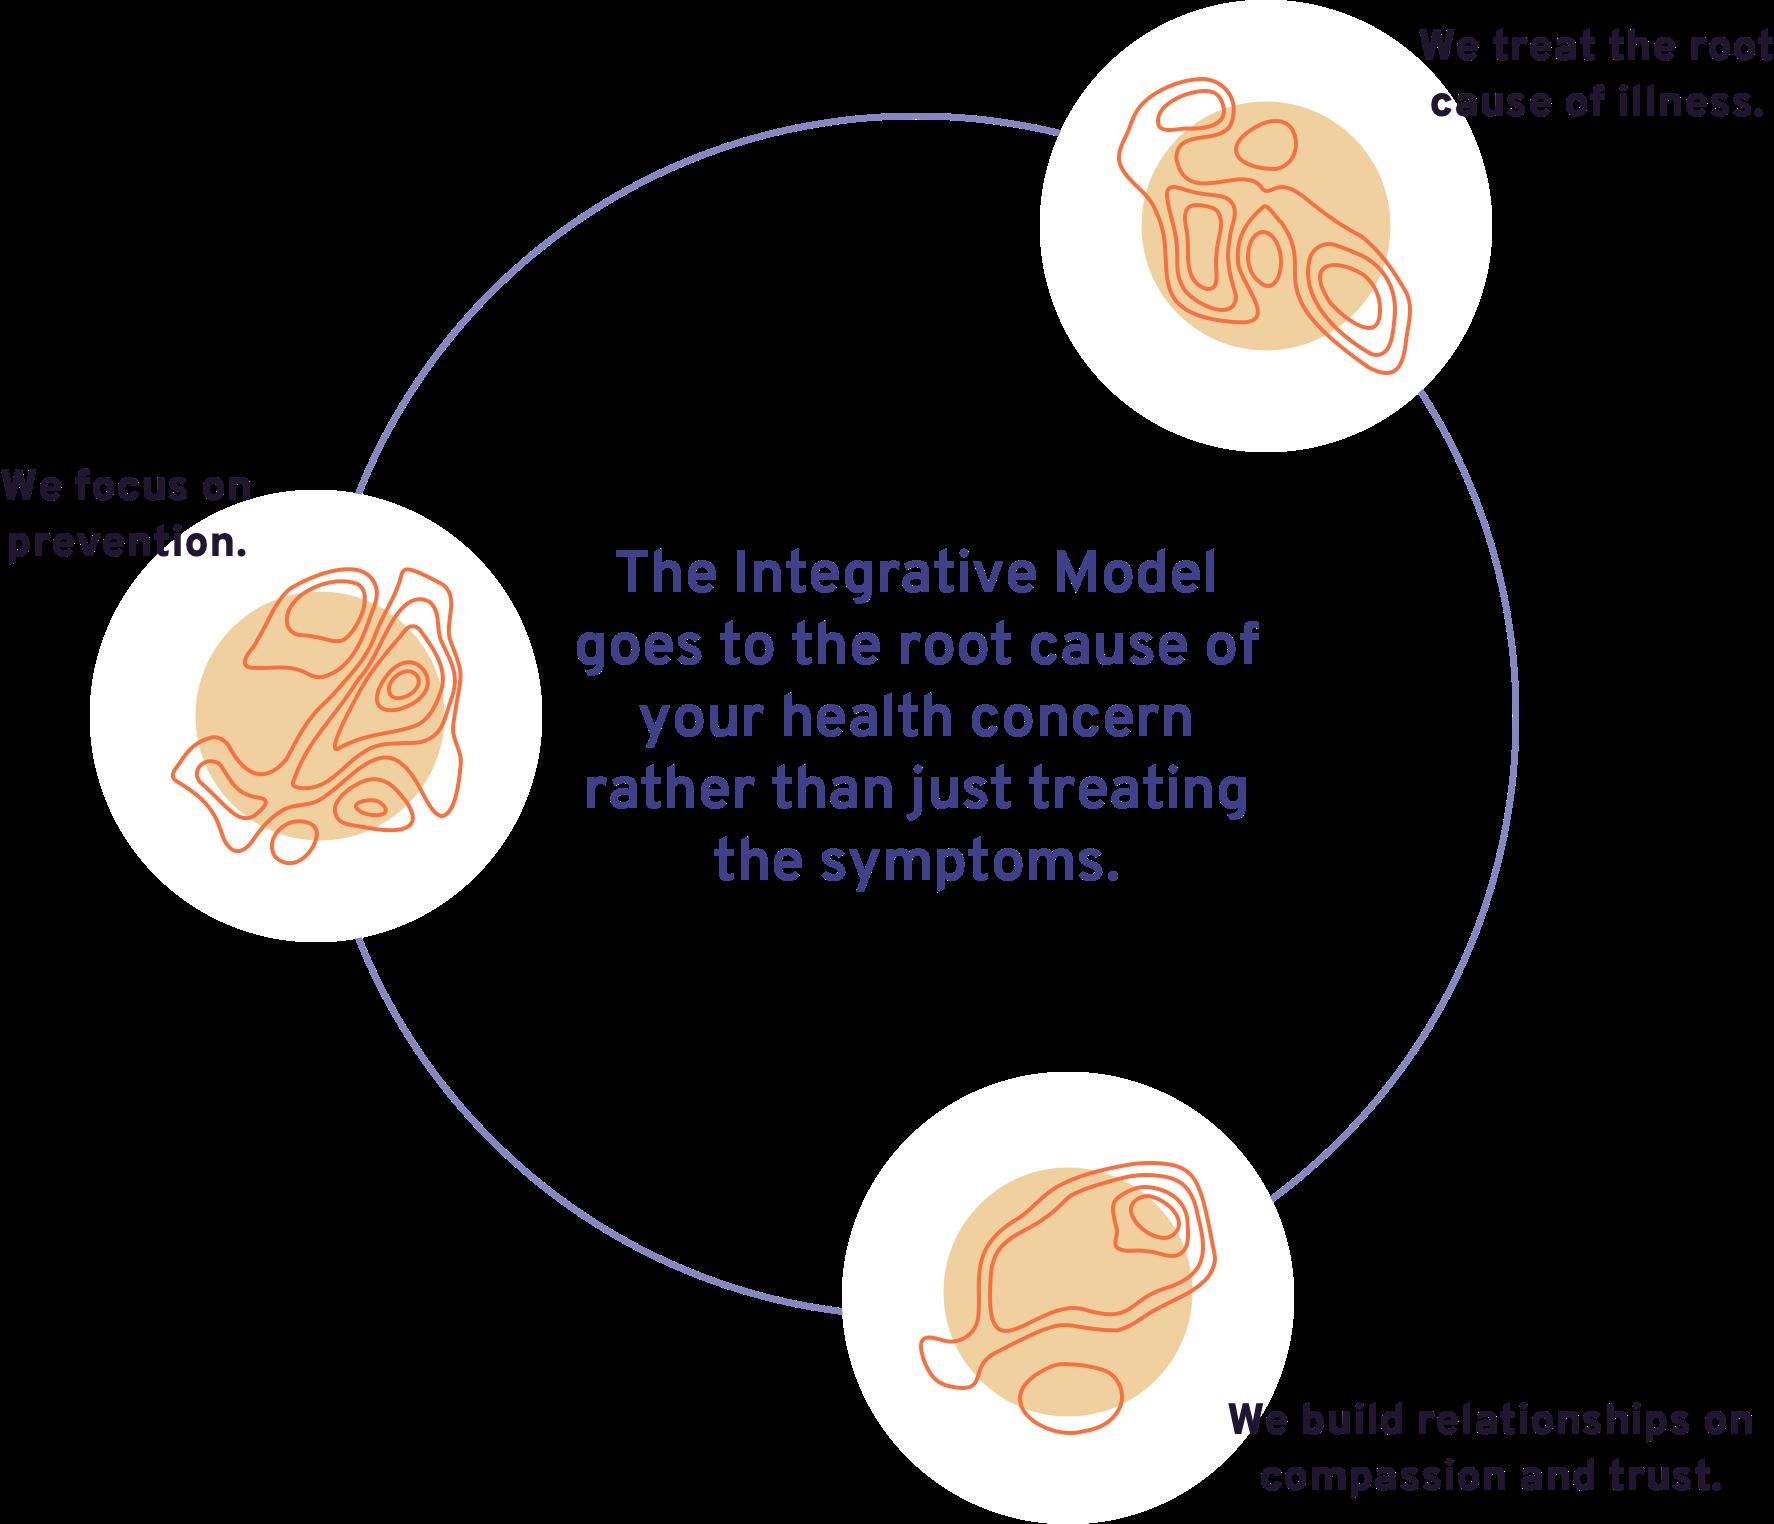 The Integrative Model